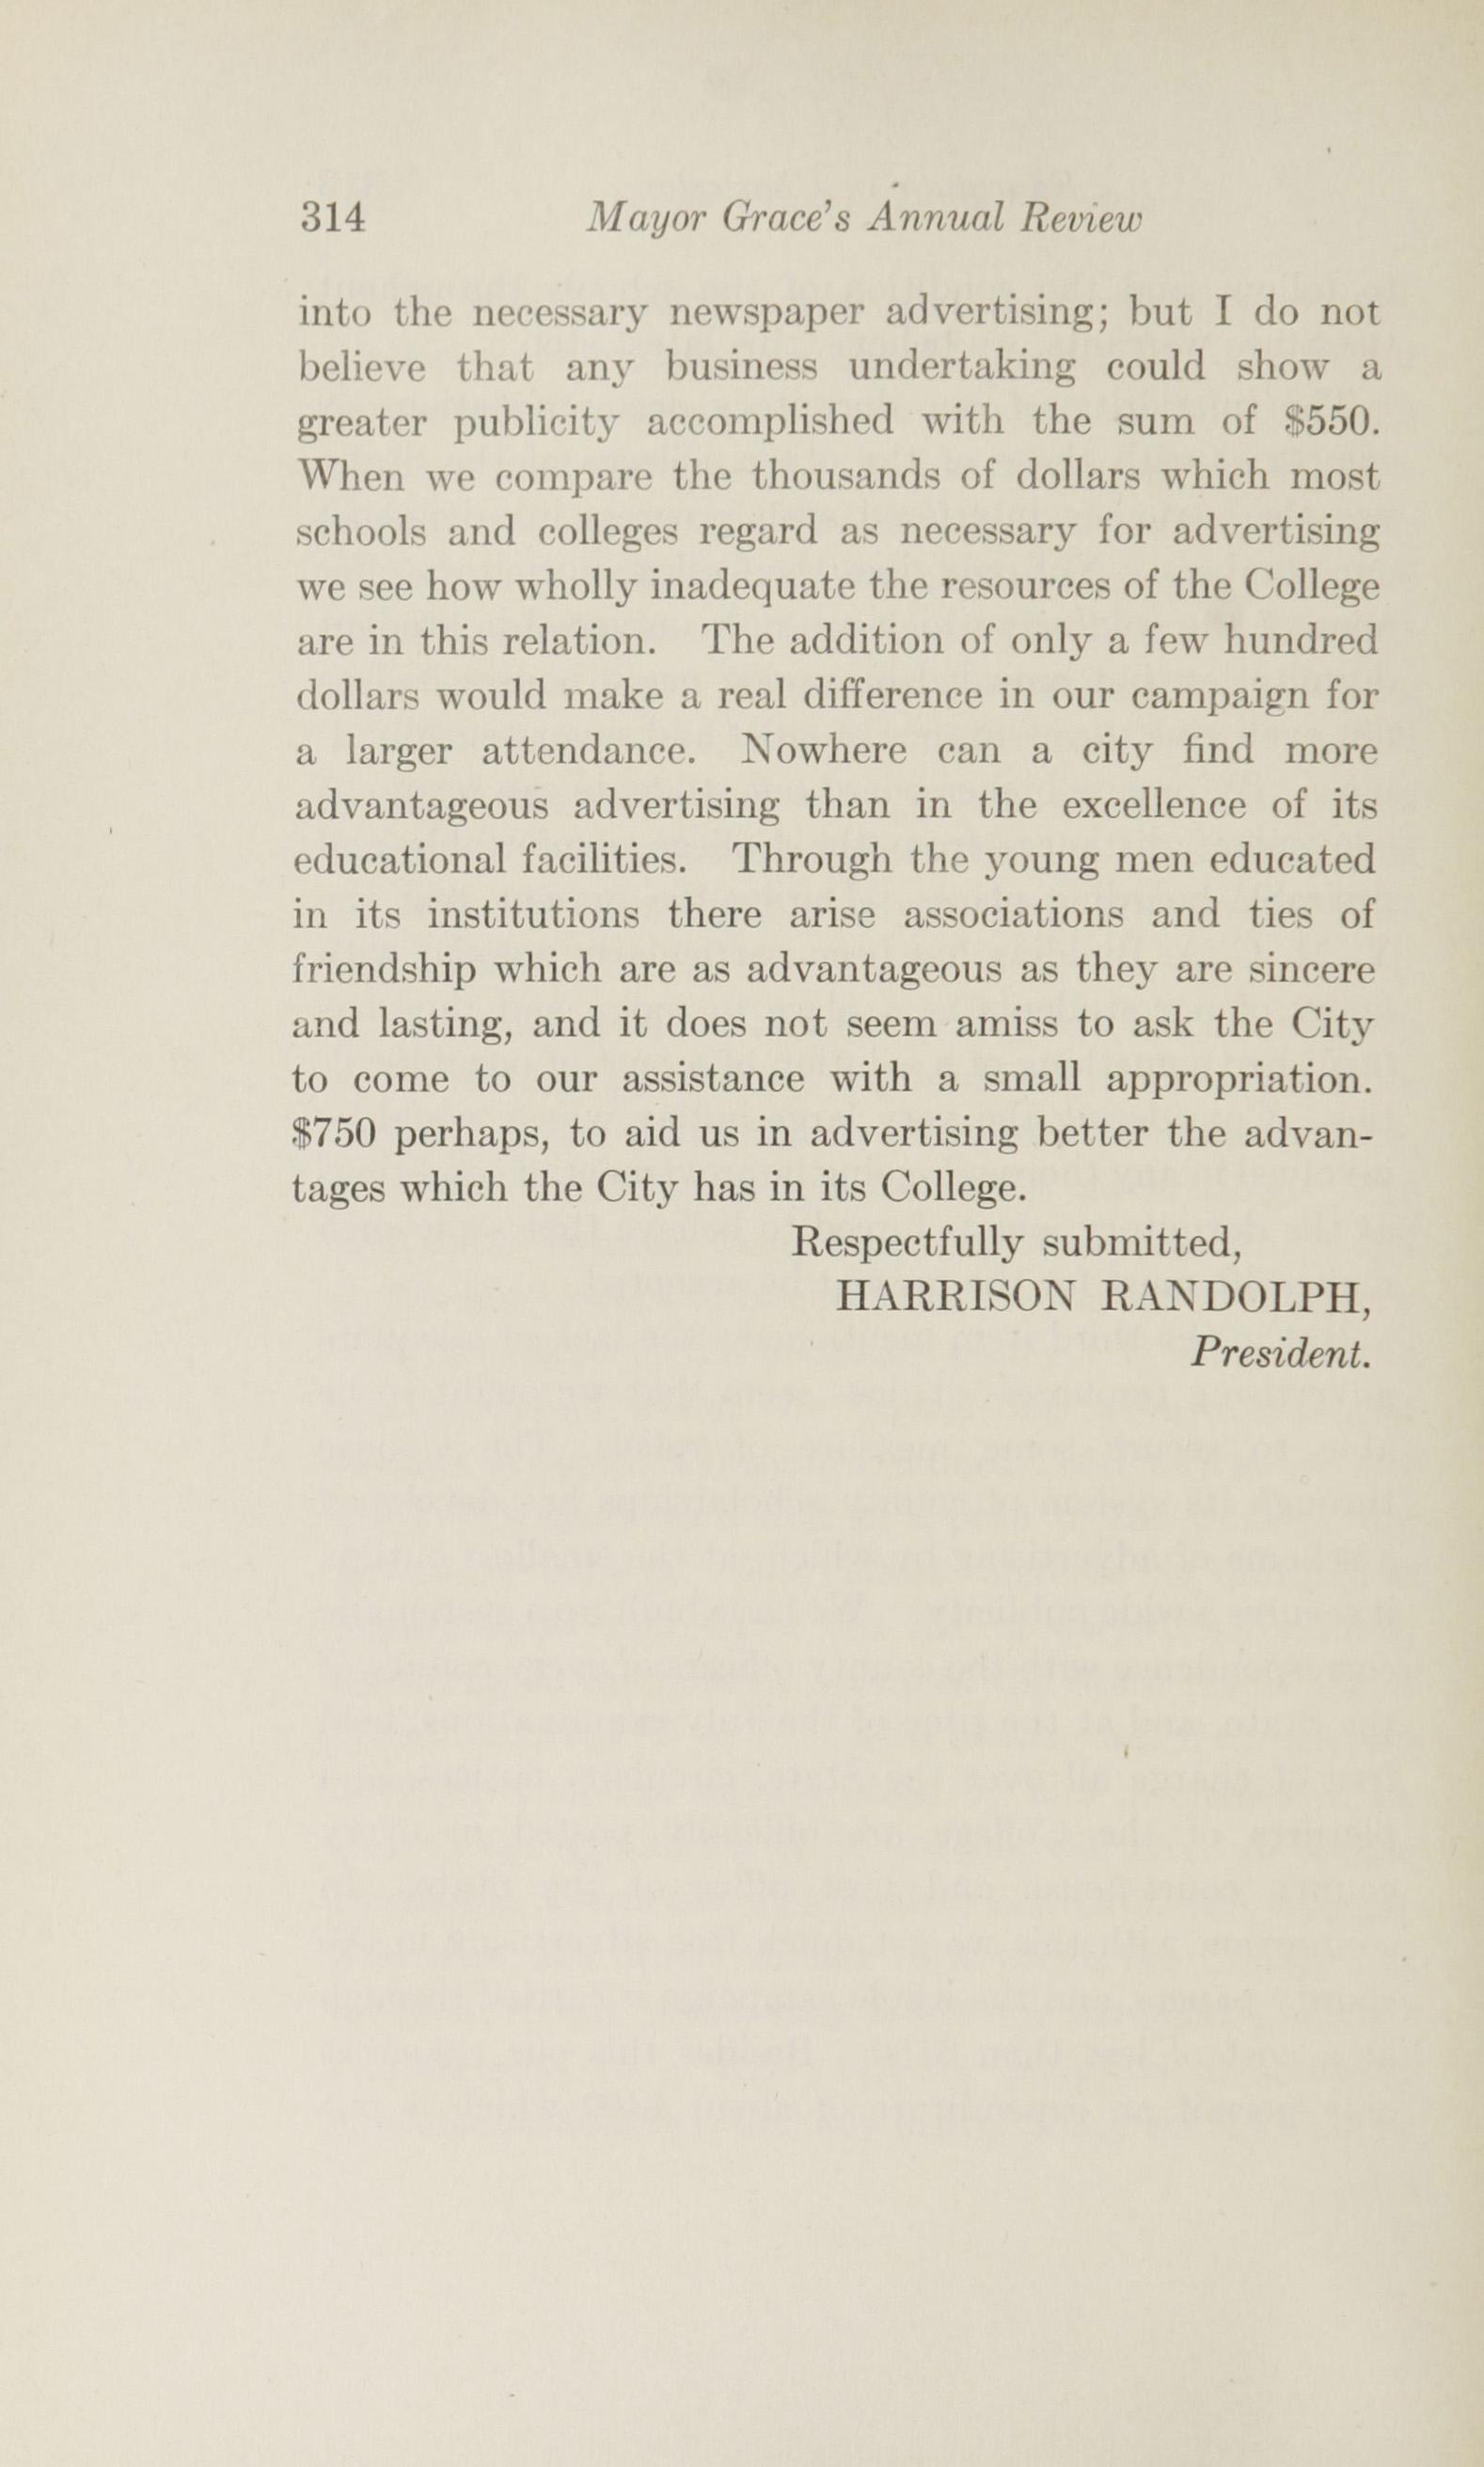 Charleston Yearbook, 1915, page 314